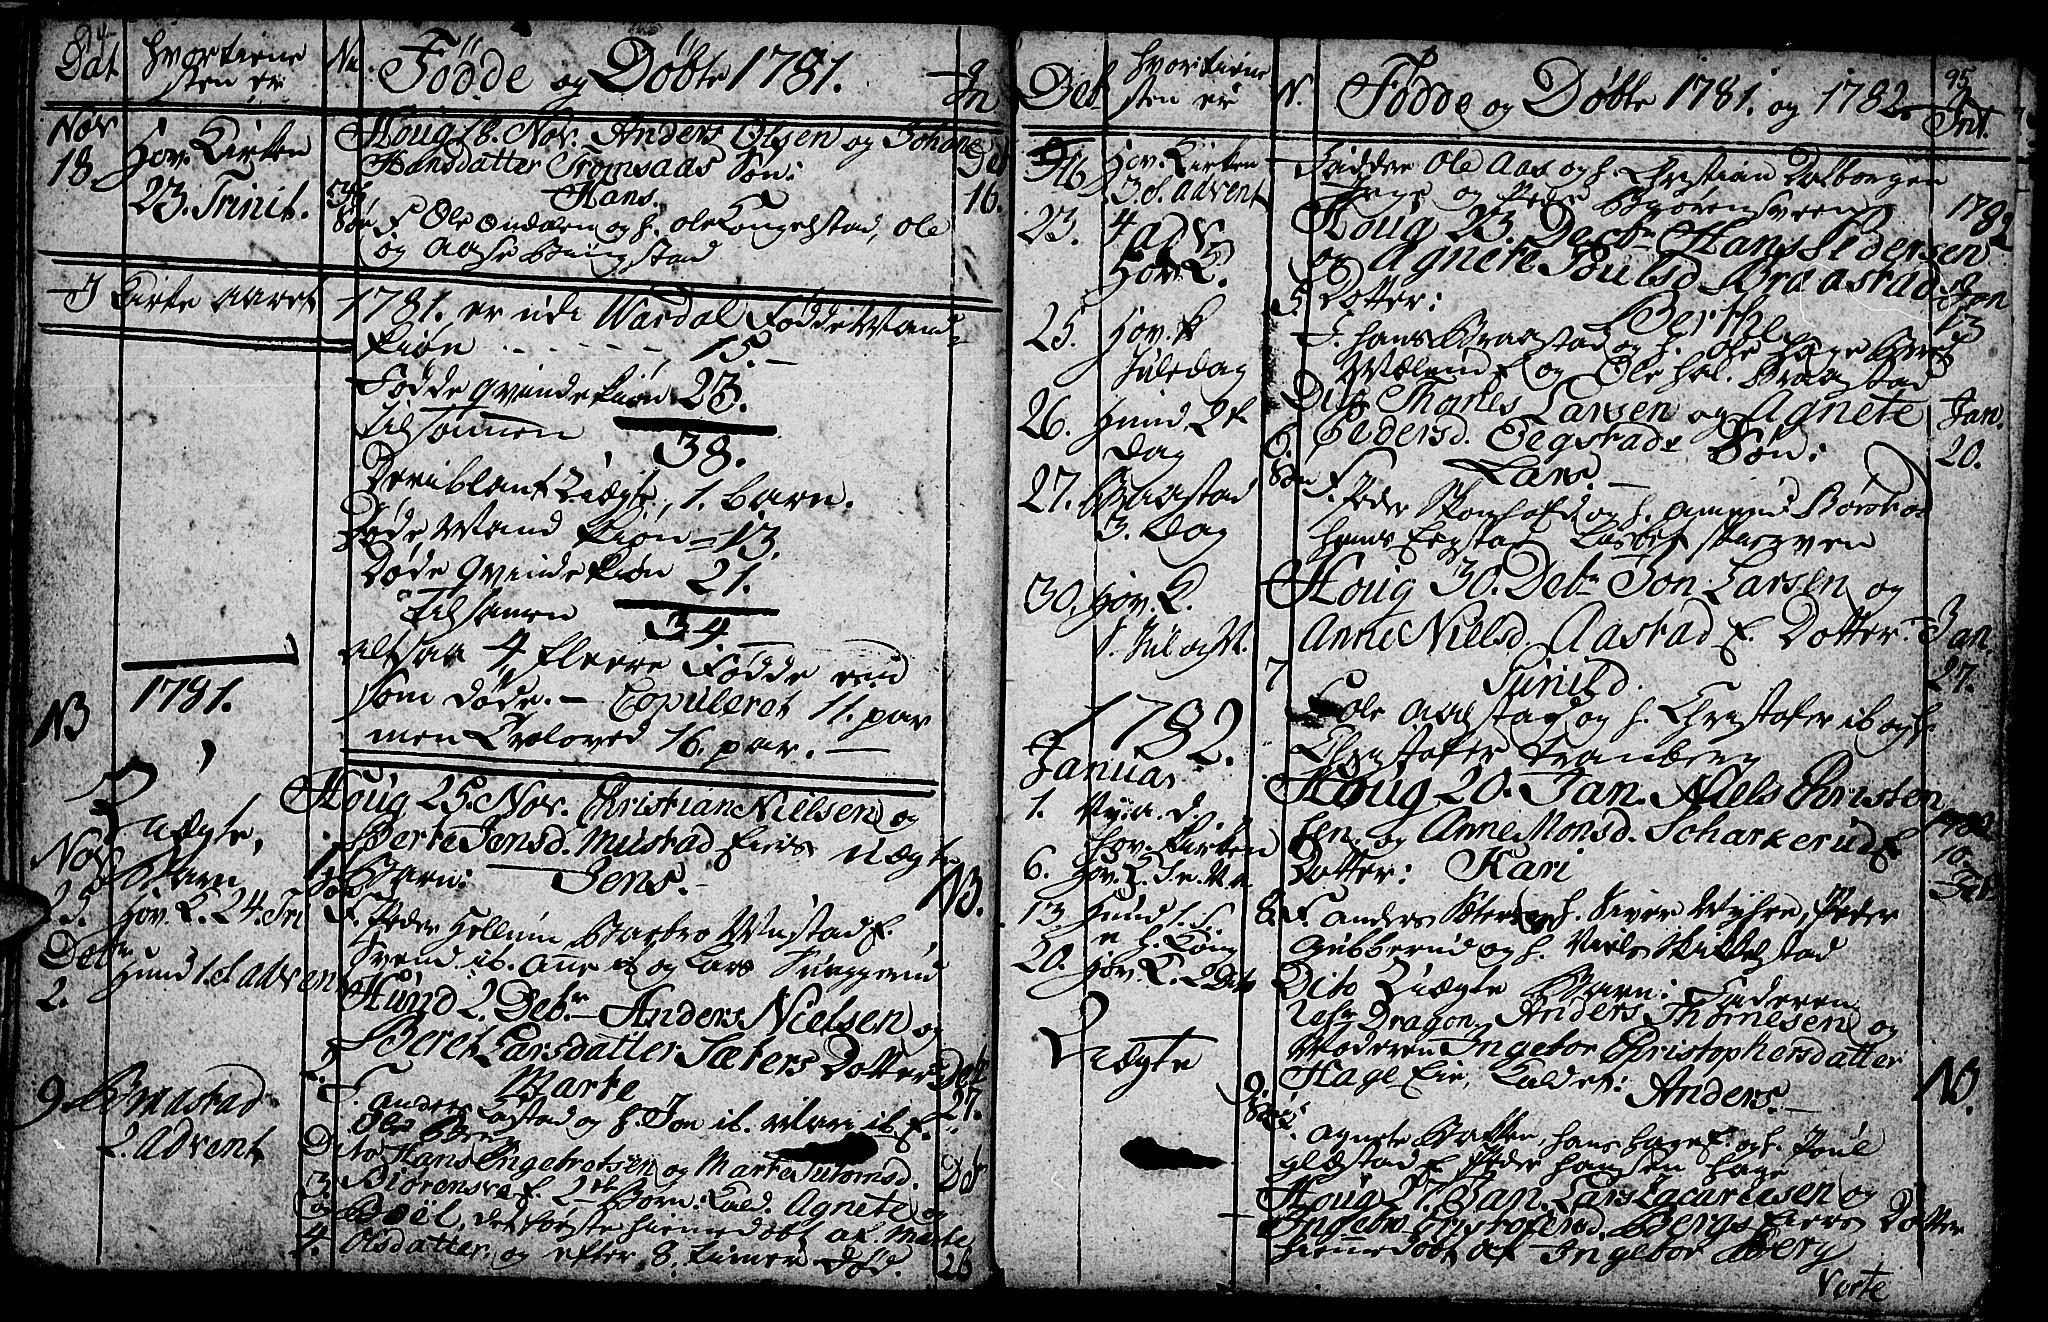 SAH, Vardal prestekontor, H/Ha/Hab/L0001: Klokkerbok nr. 1, 1771-1790, s. 94-95